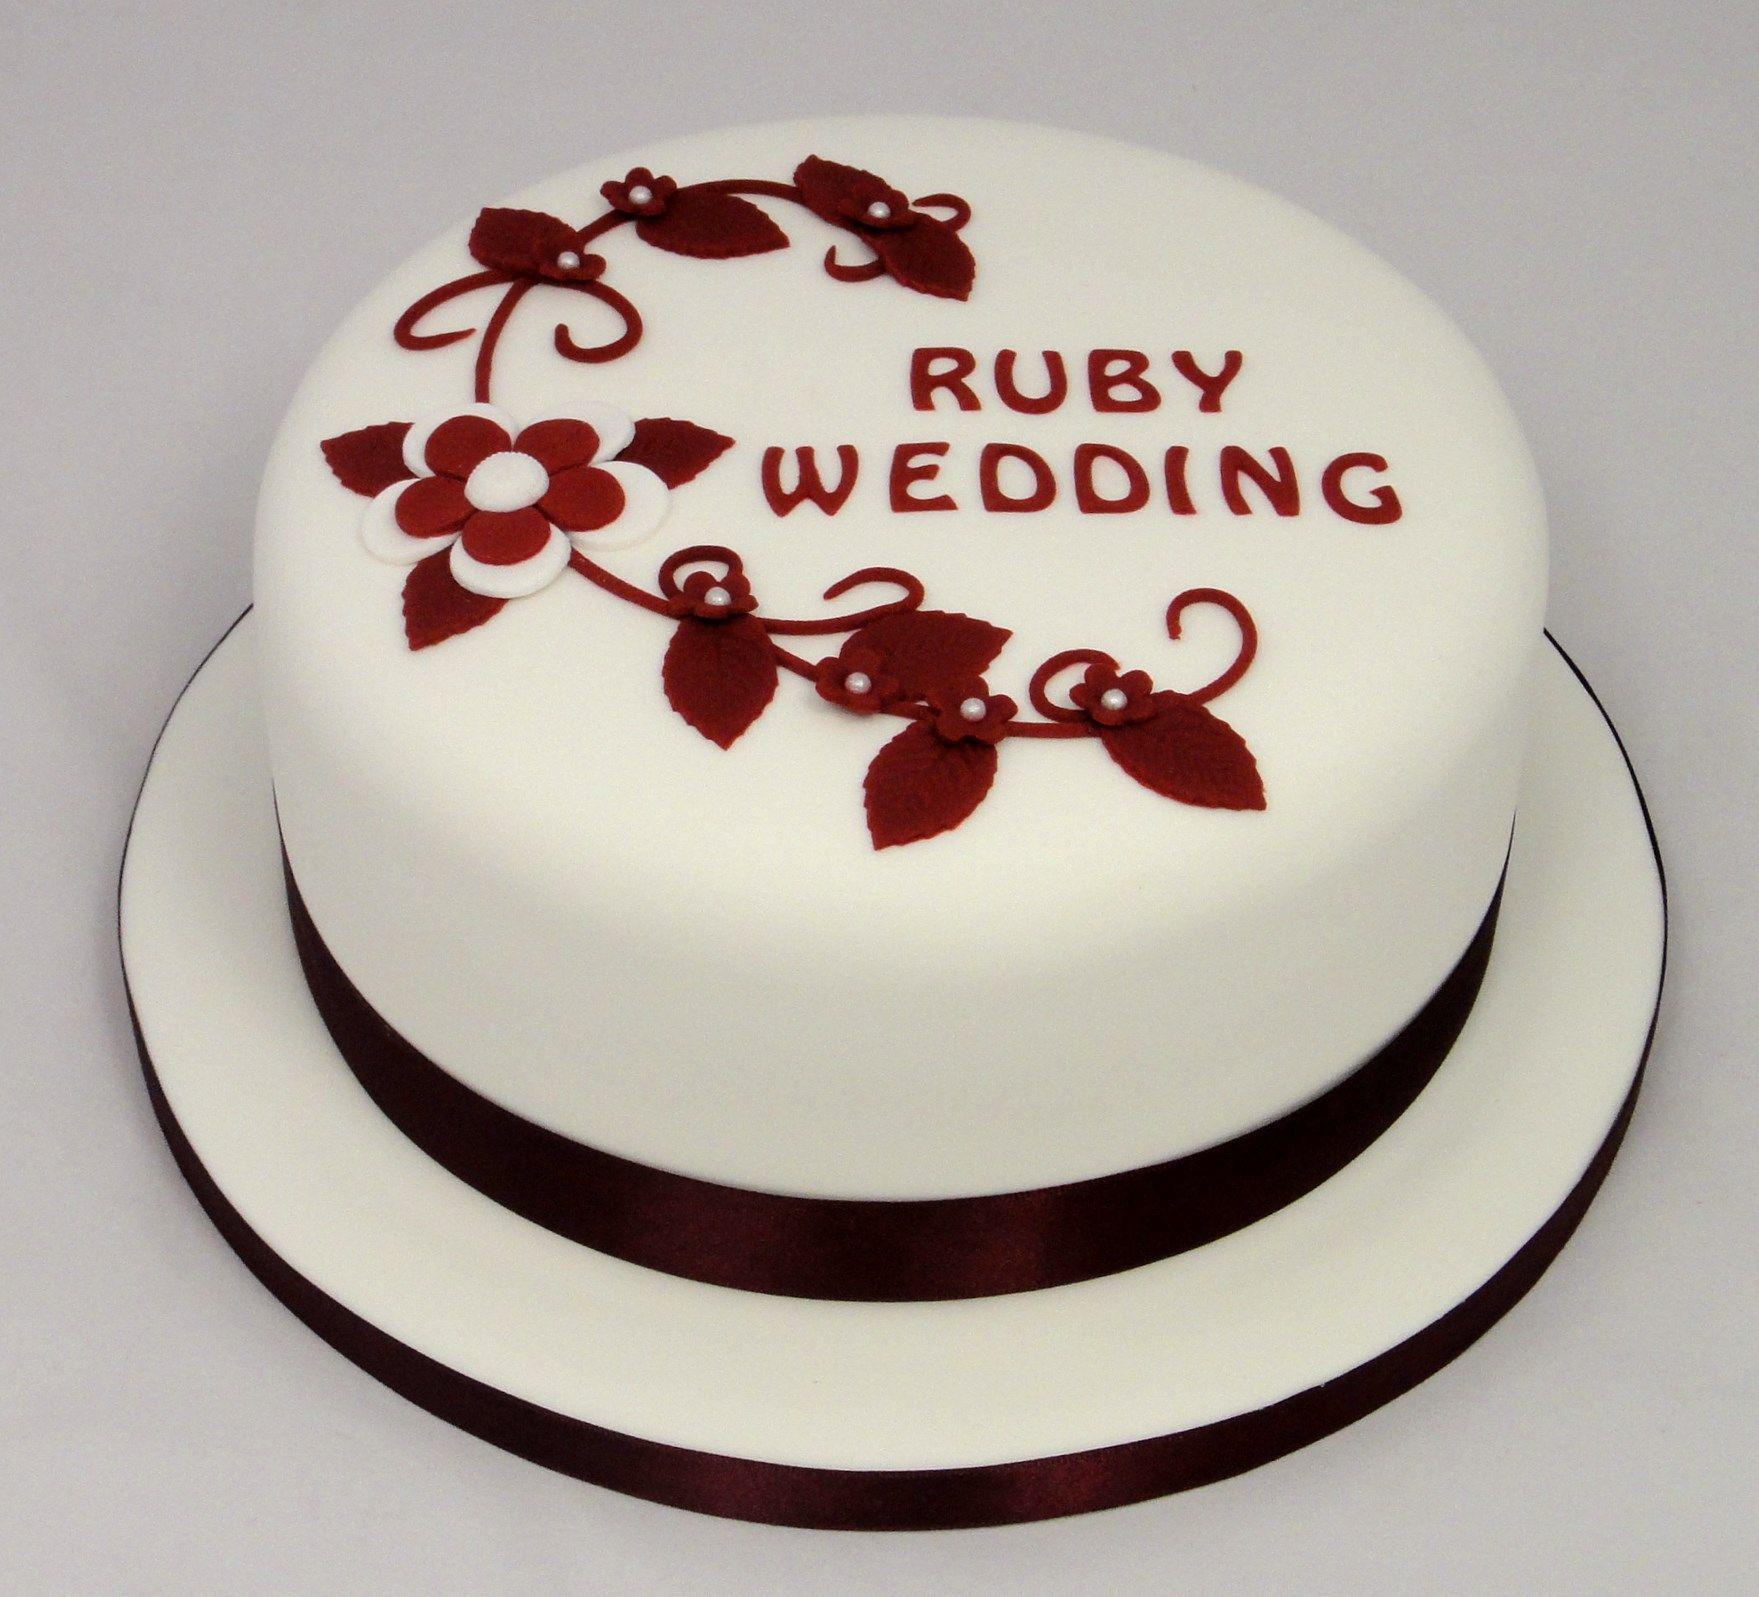 Ruby Wedding Anniversary Cake 07917815712 www